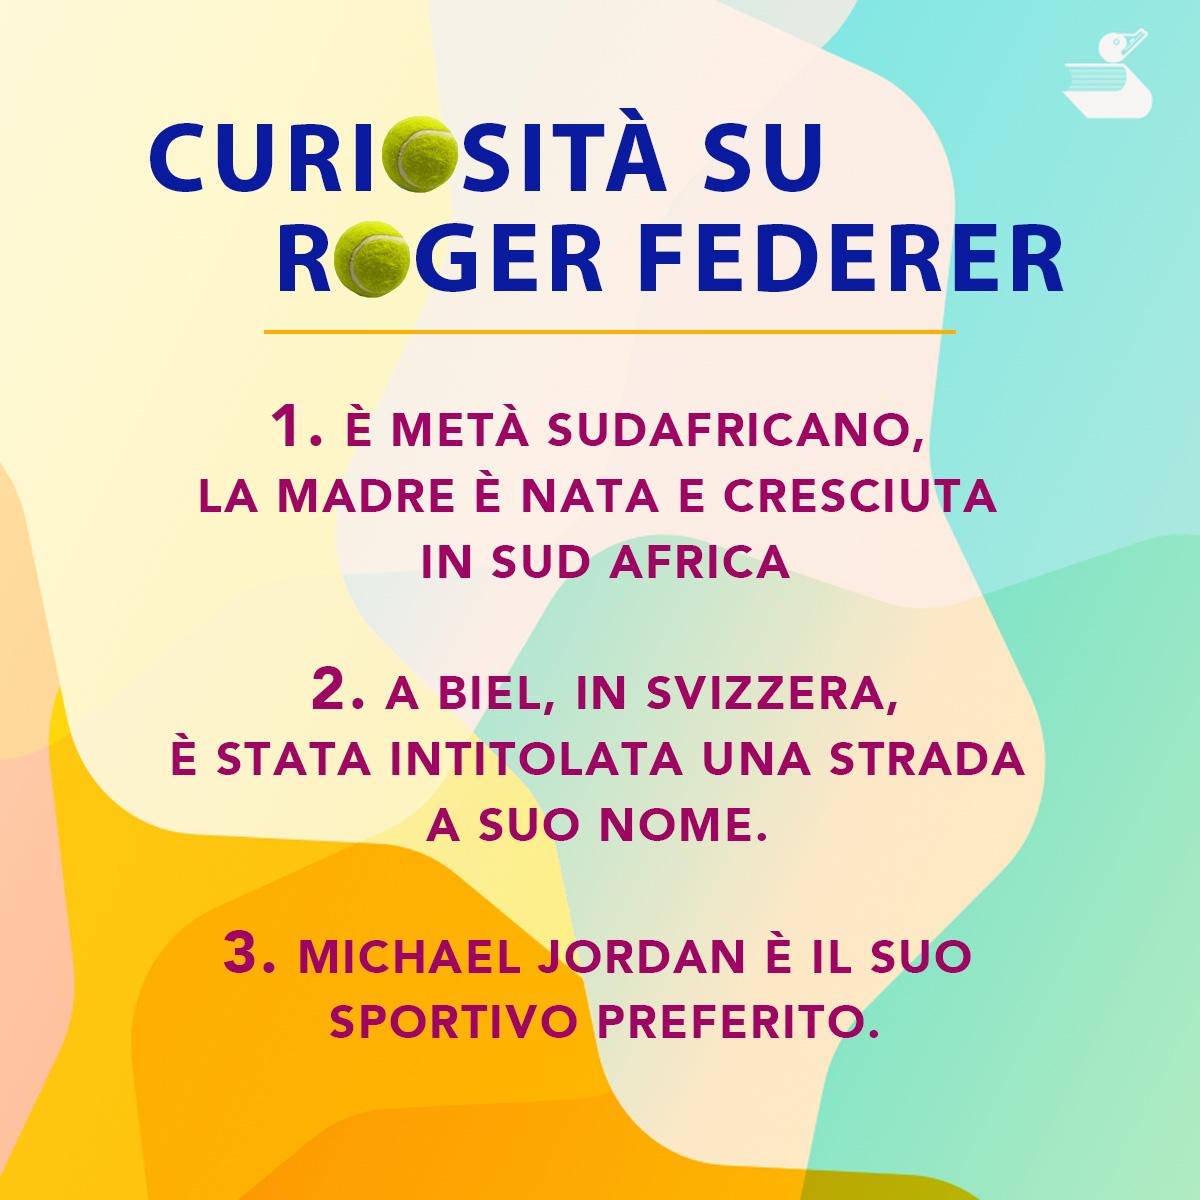 #rogerfederer